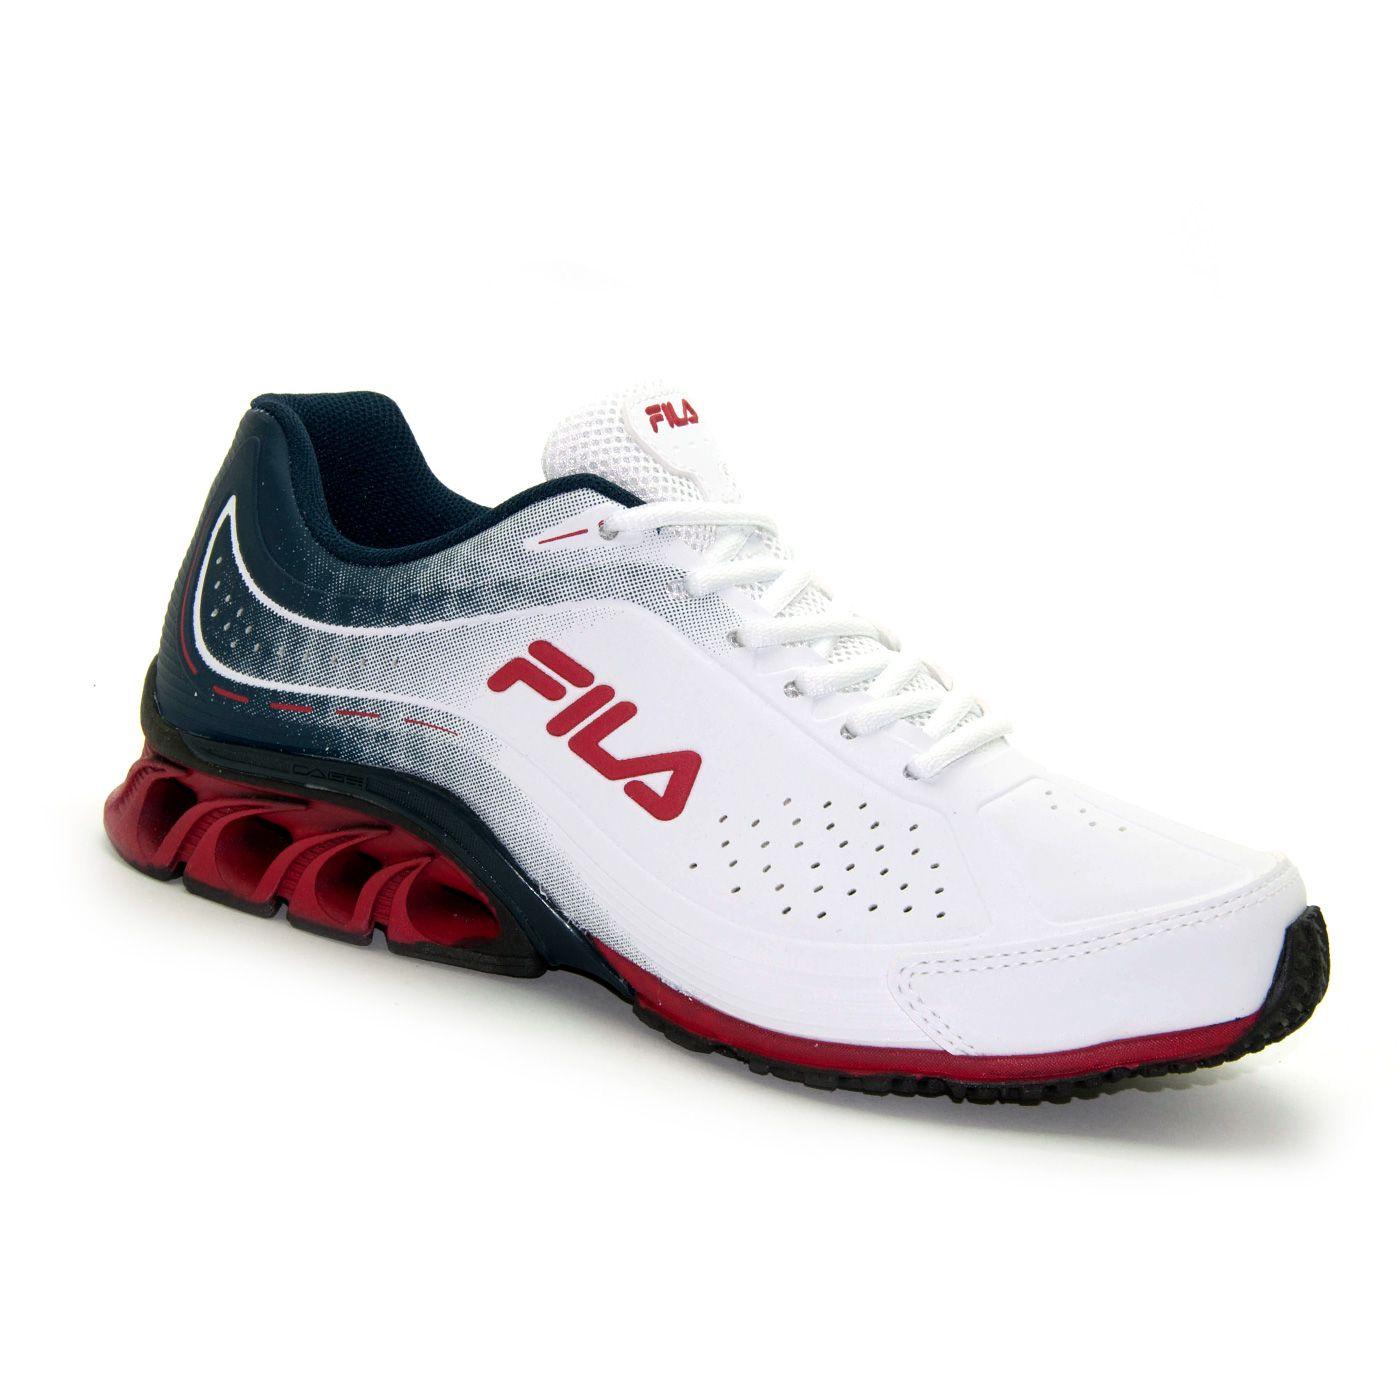 TÊNIS FILA CAGE PYTHON FOOTWEAR - 11J481X